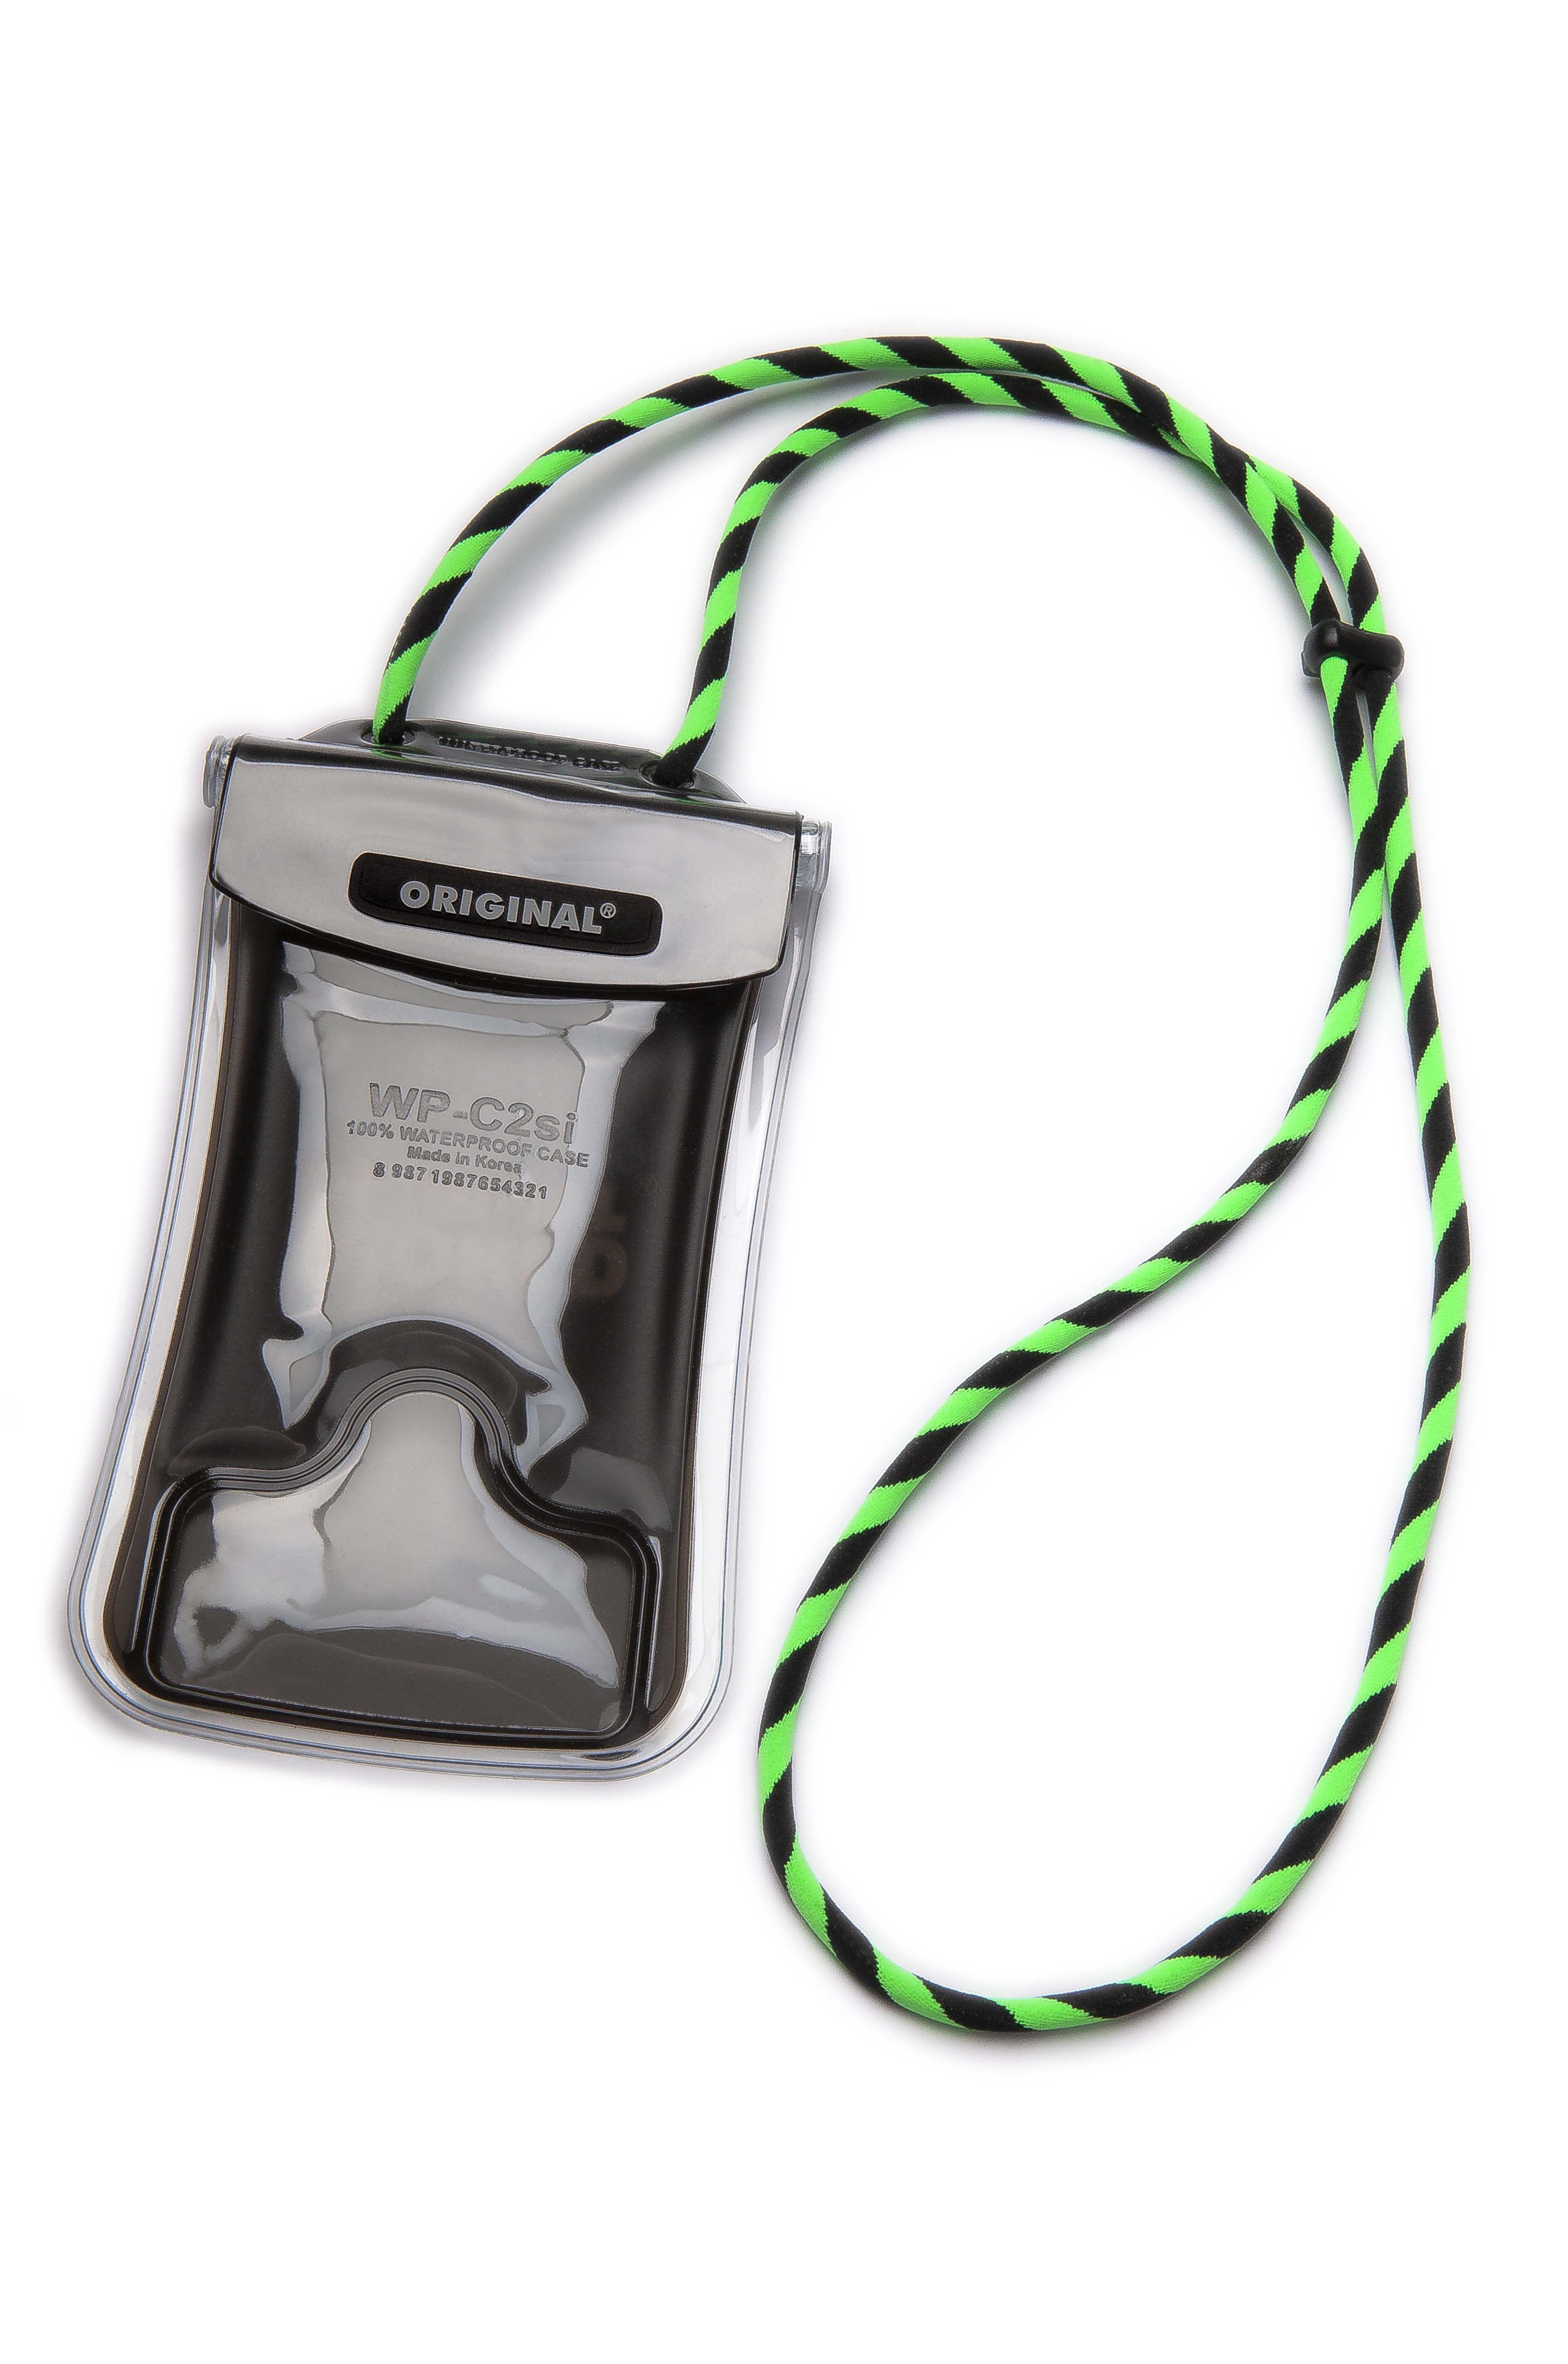 Porta-chaves Original Lanyards SURFIE PRO XL CLEAR Hexachrome Green/Black